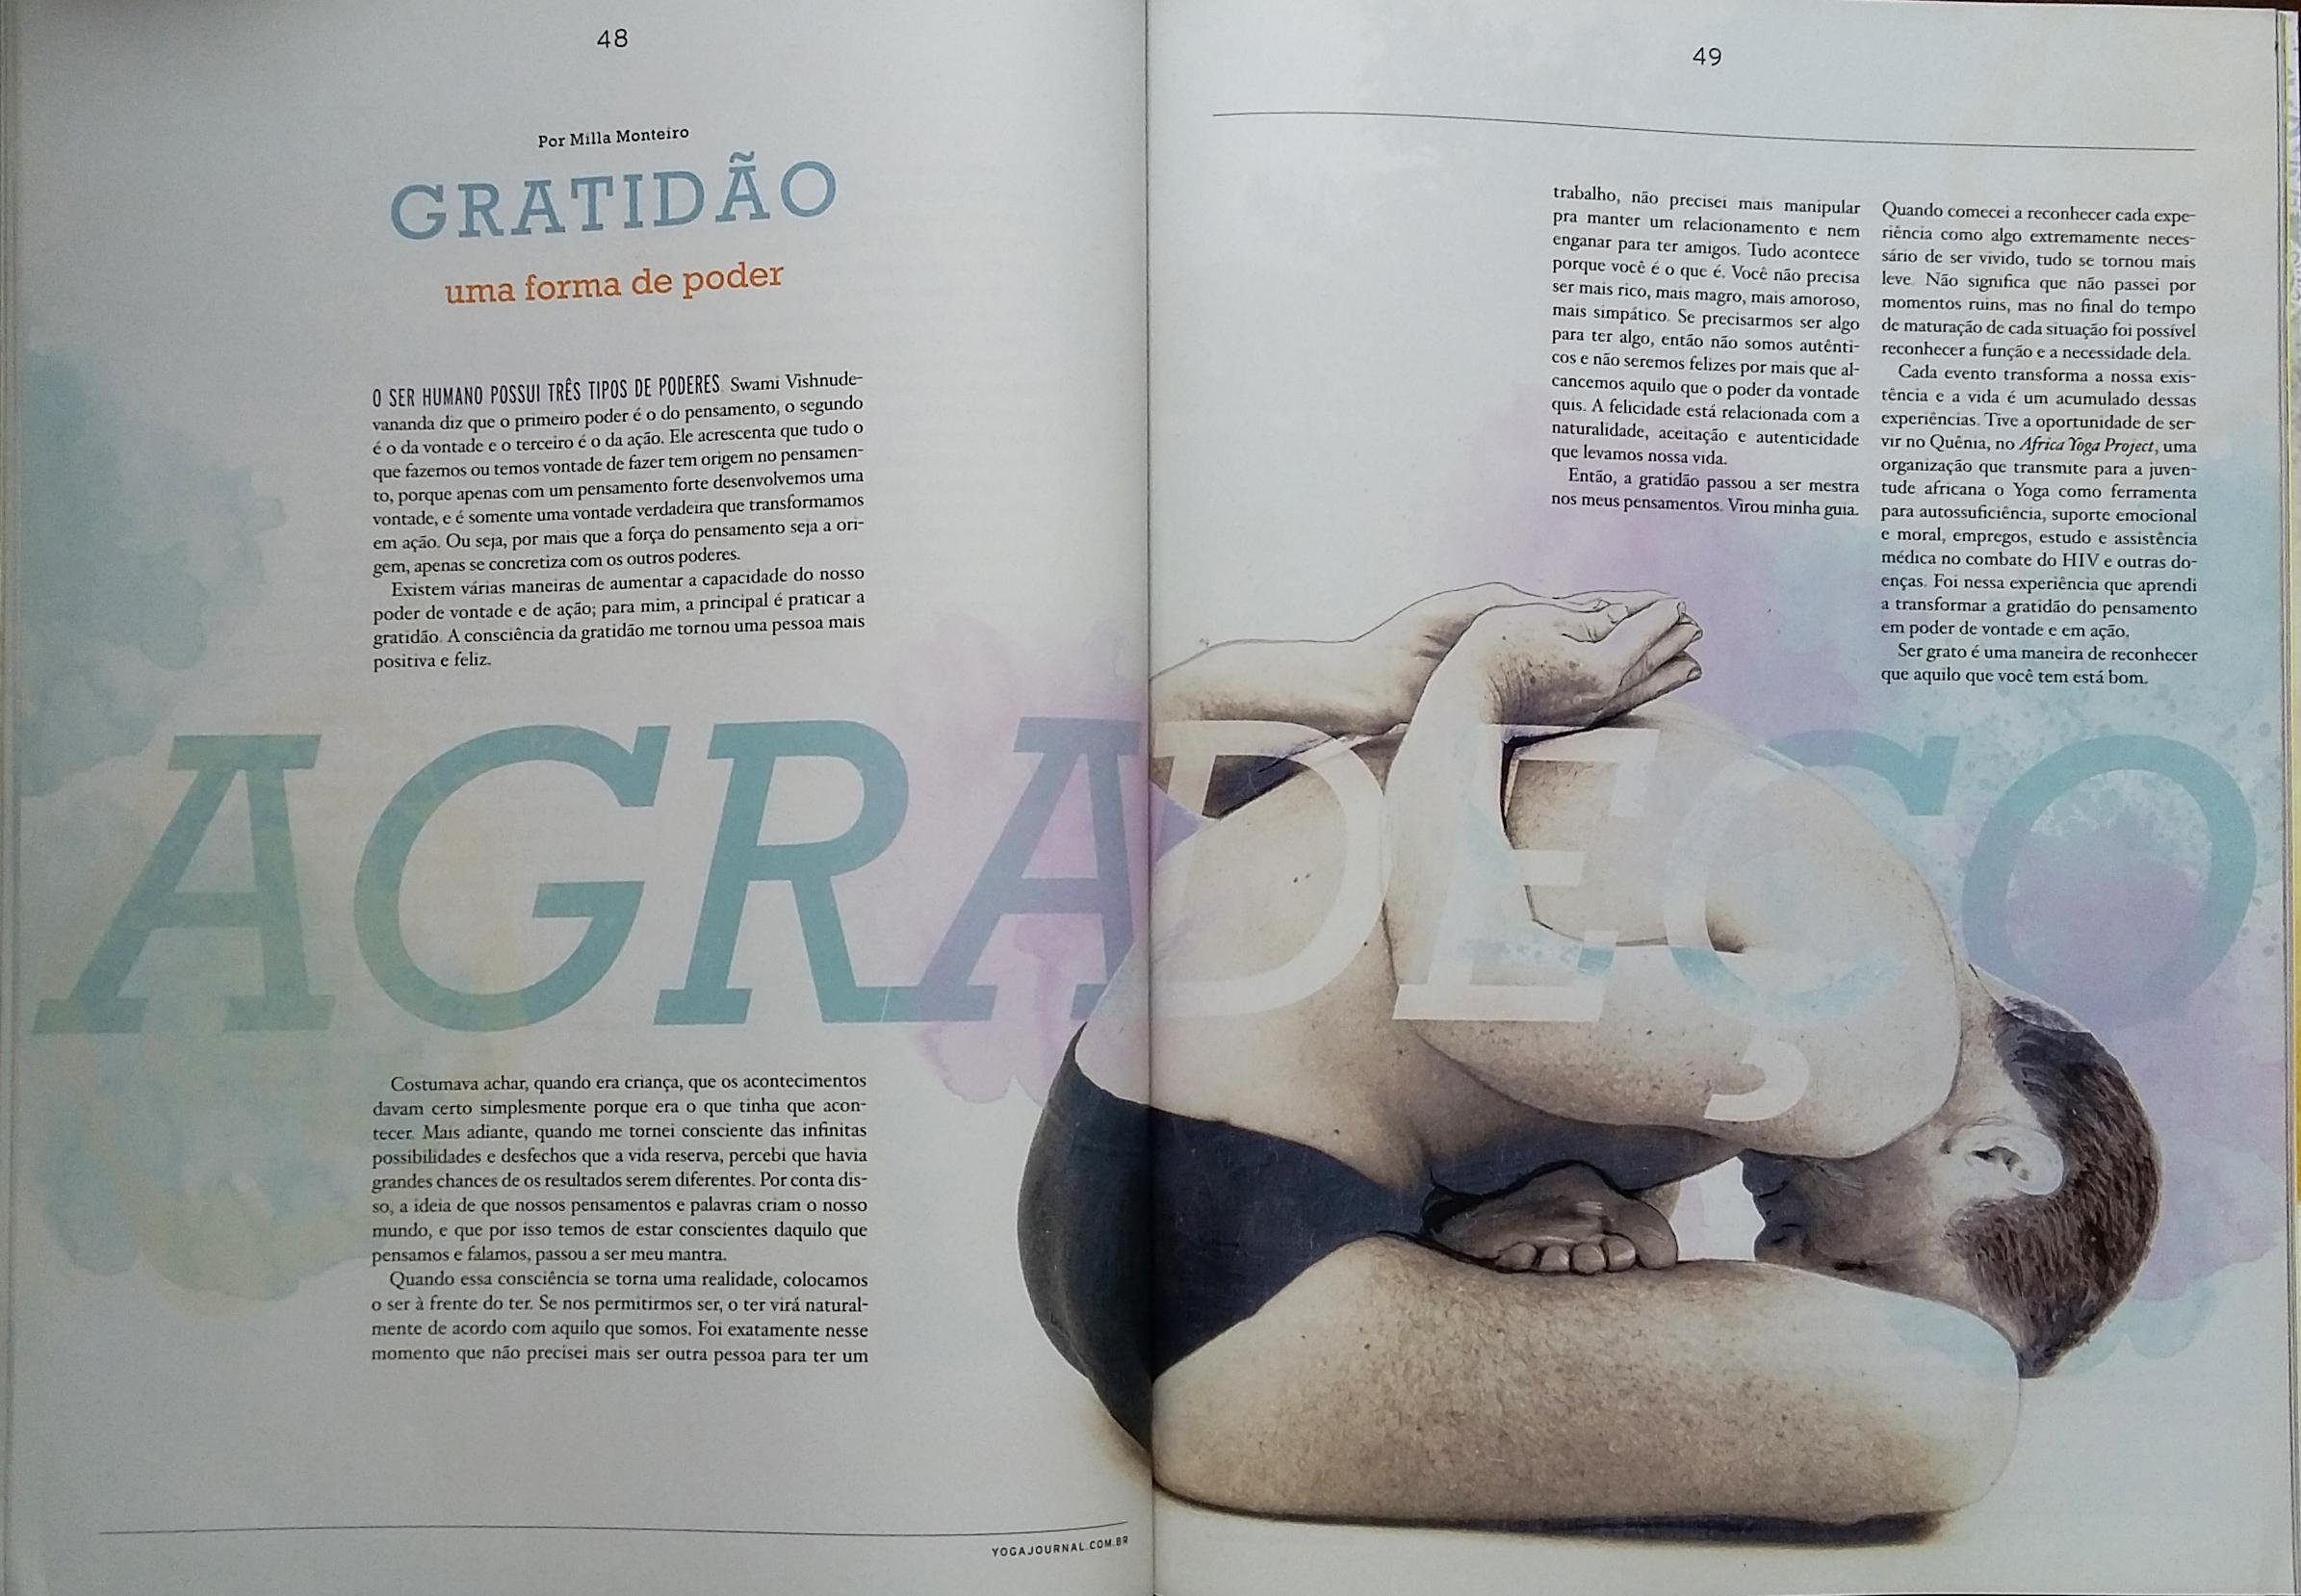 YogaJournal-Hermogenes-gratidão.jpg